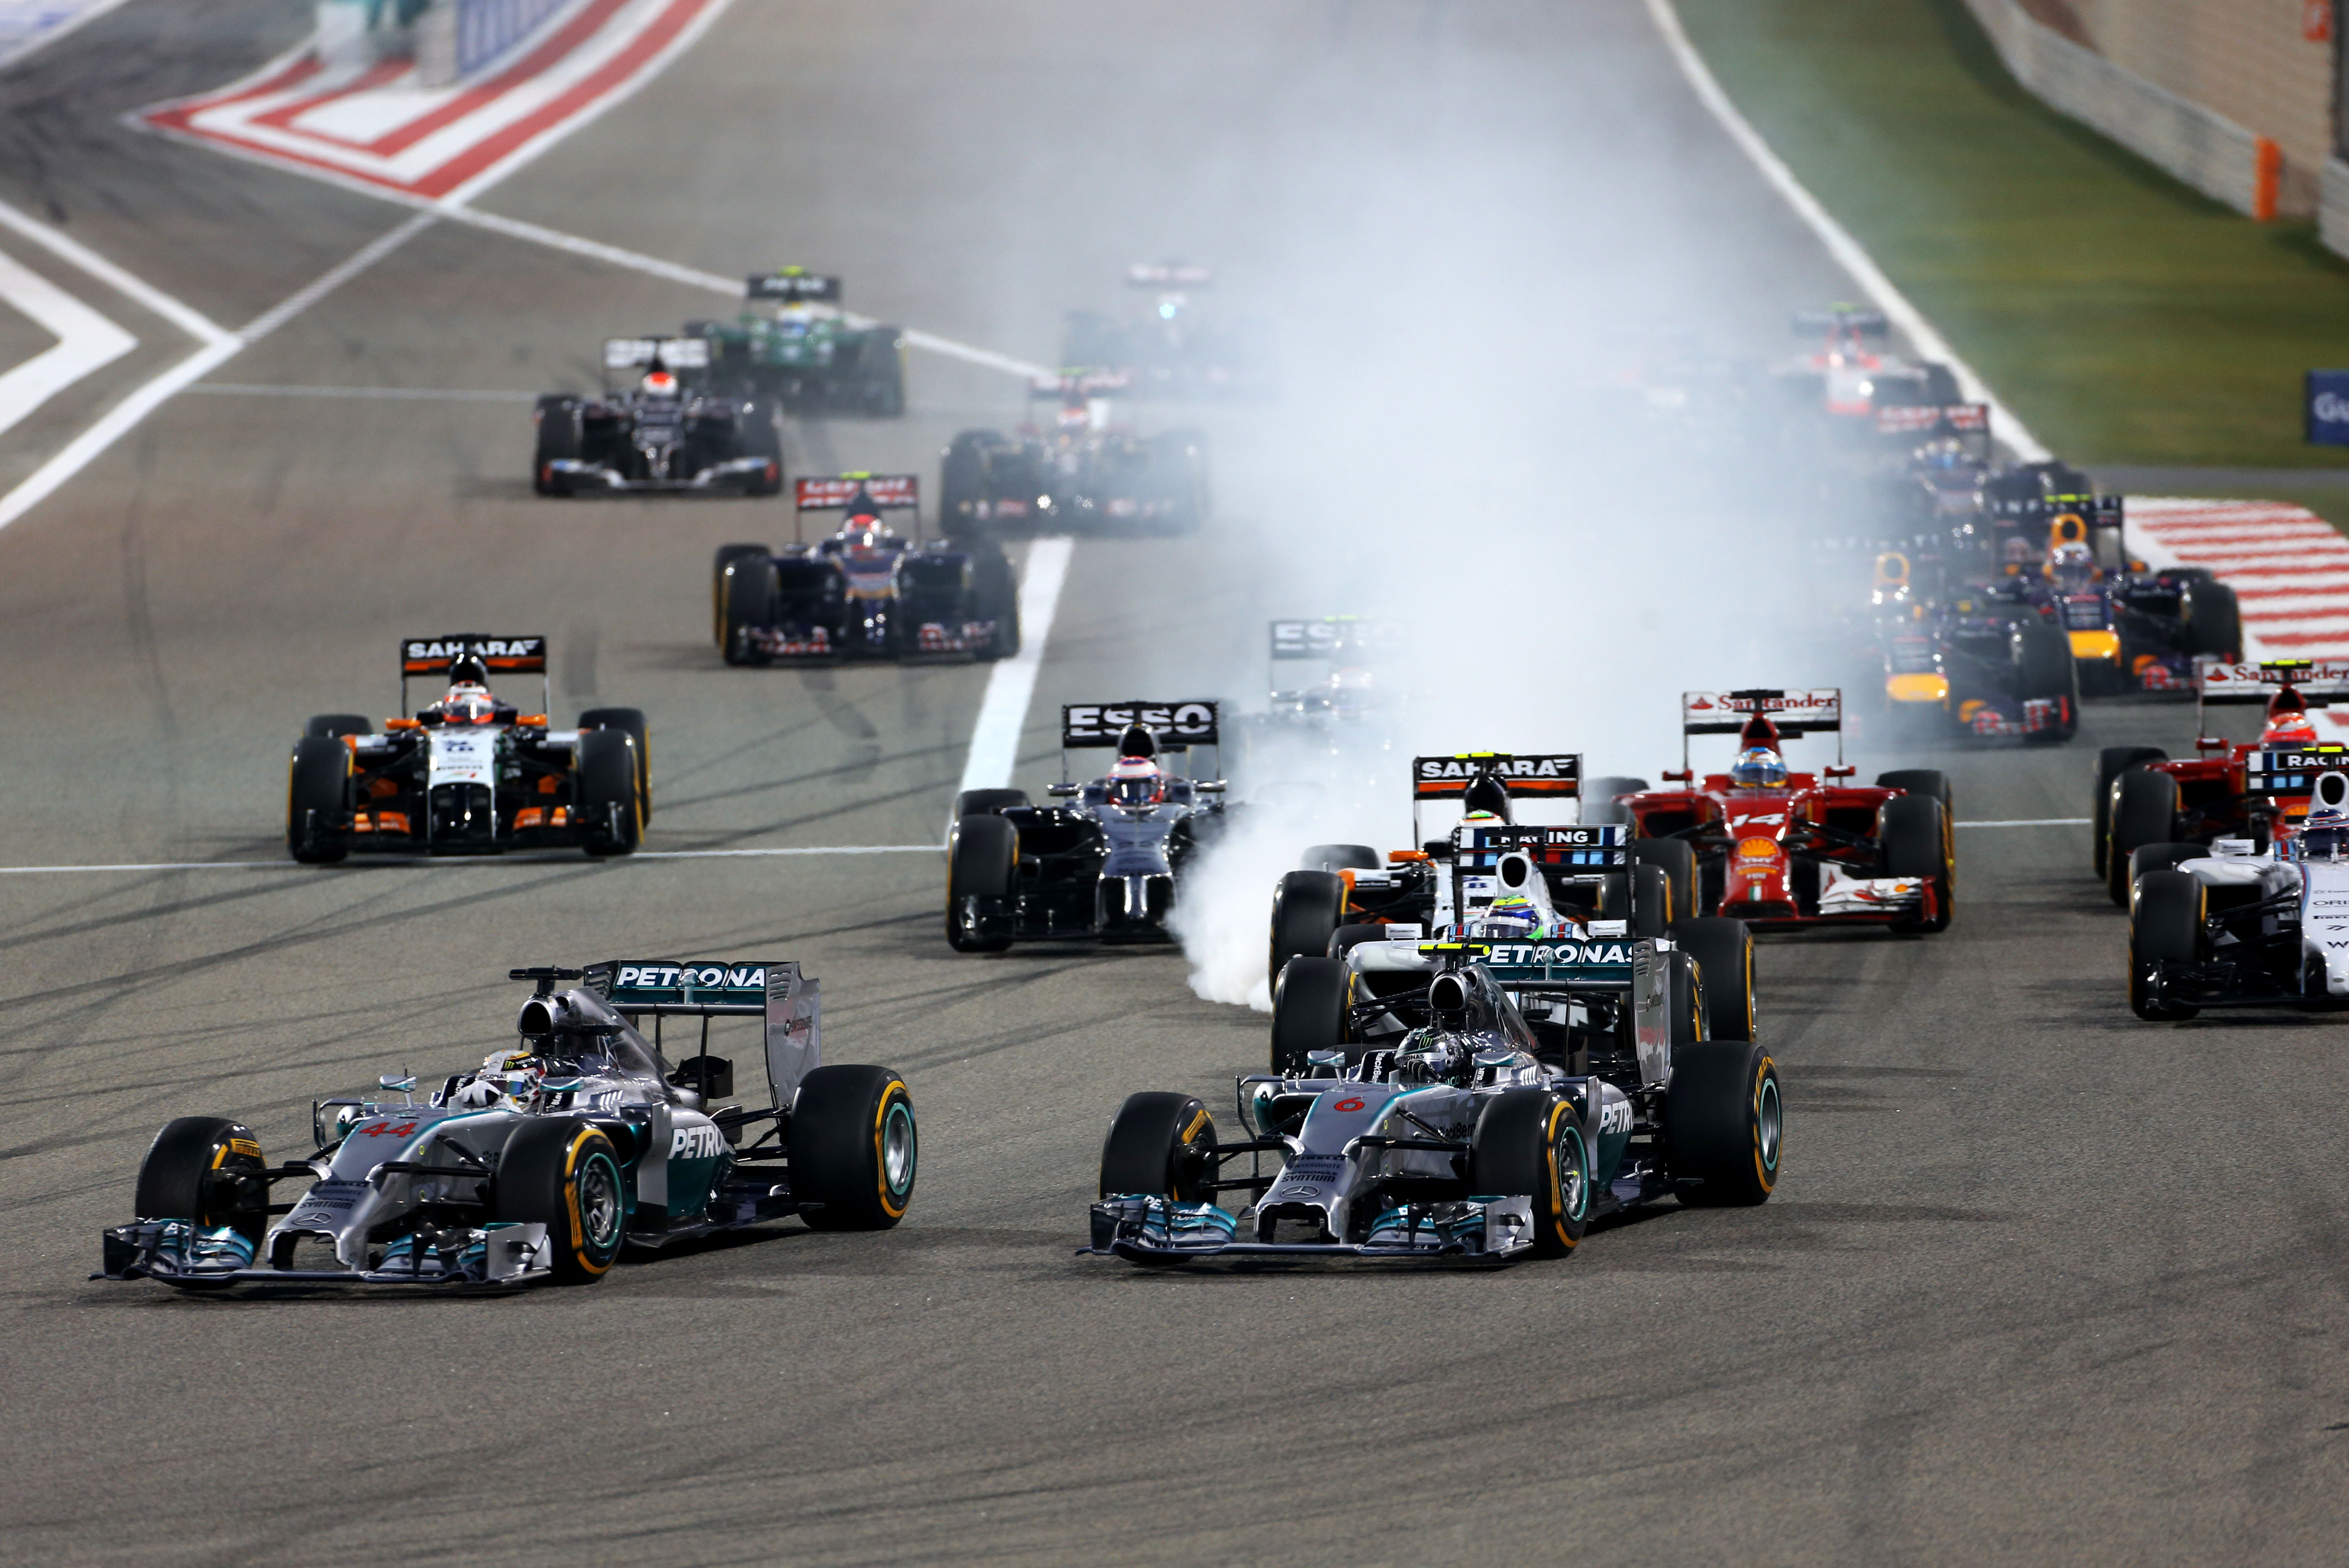 Lewis Hamilton Nico Rosberg Mercedes F1 2014